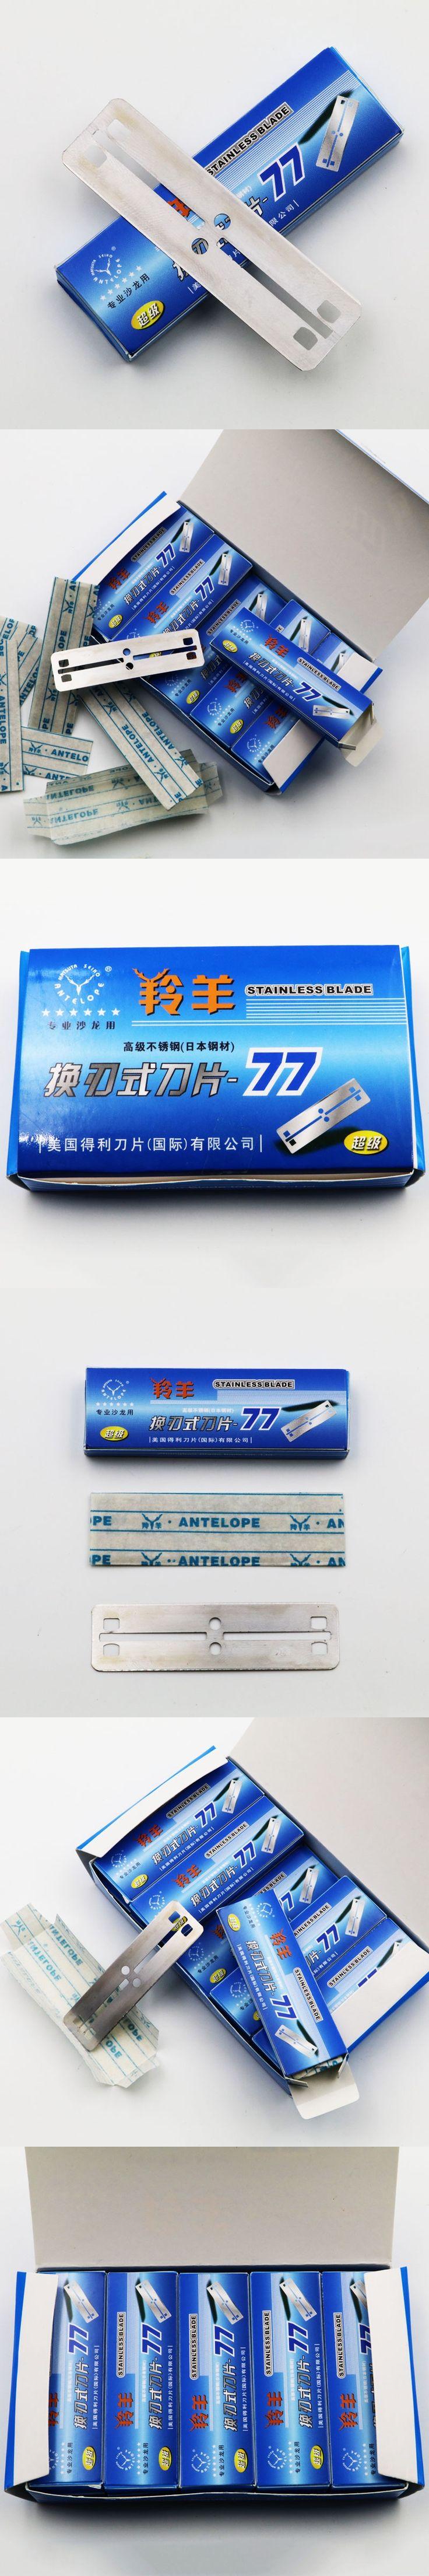 100 Pcs Antelope Super-77 Razor Blades Brand Stainless Steel Safety Razor Blades To Shave Blade To Razor For Men Barber Blade